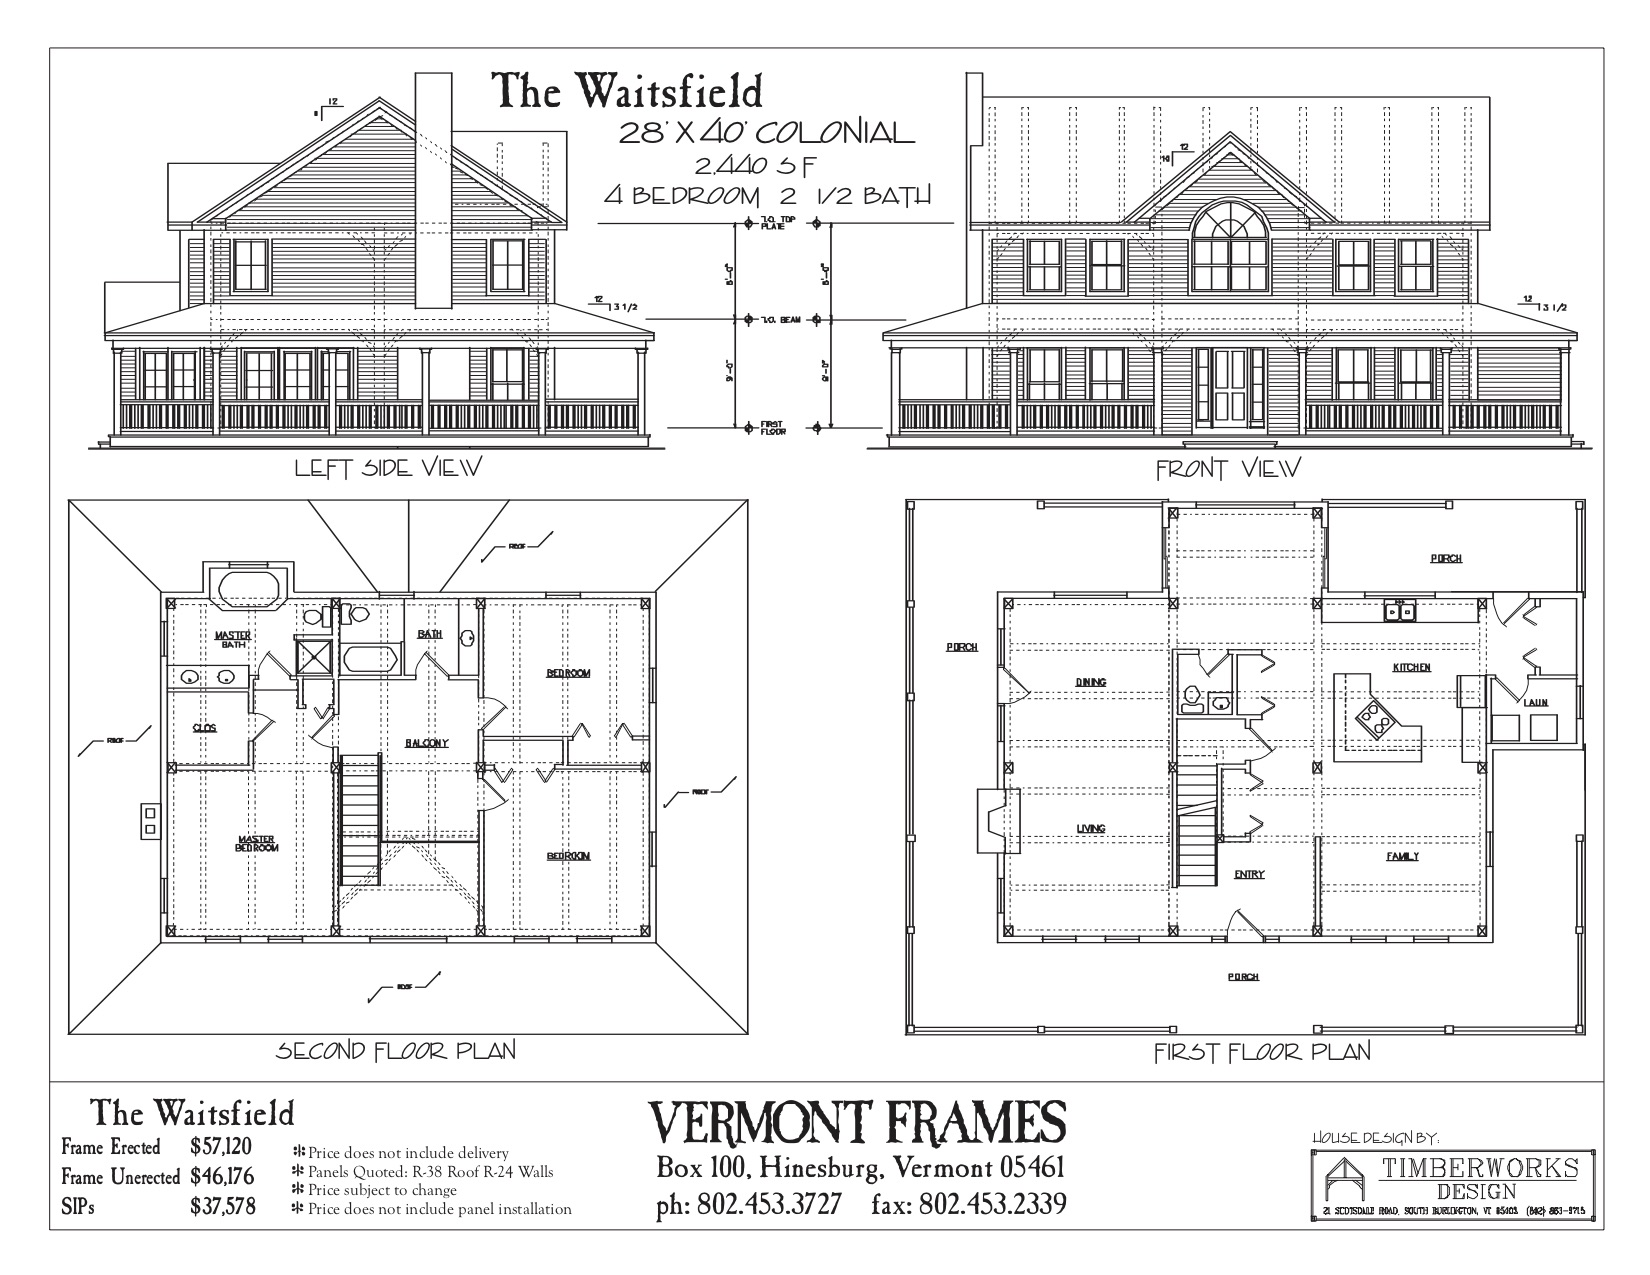 Waitsfield Colonial floor plan